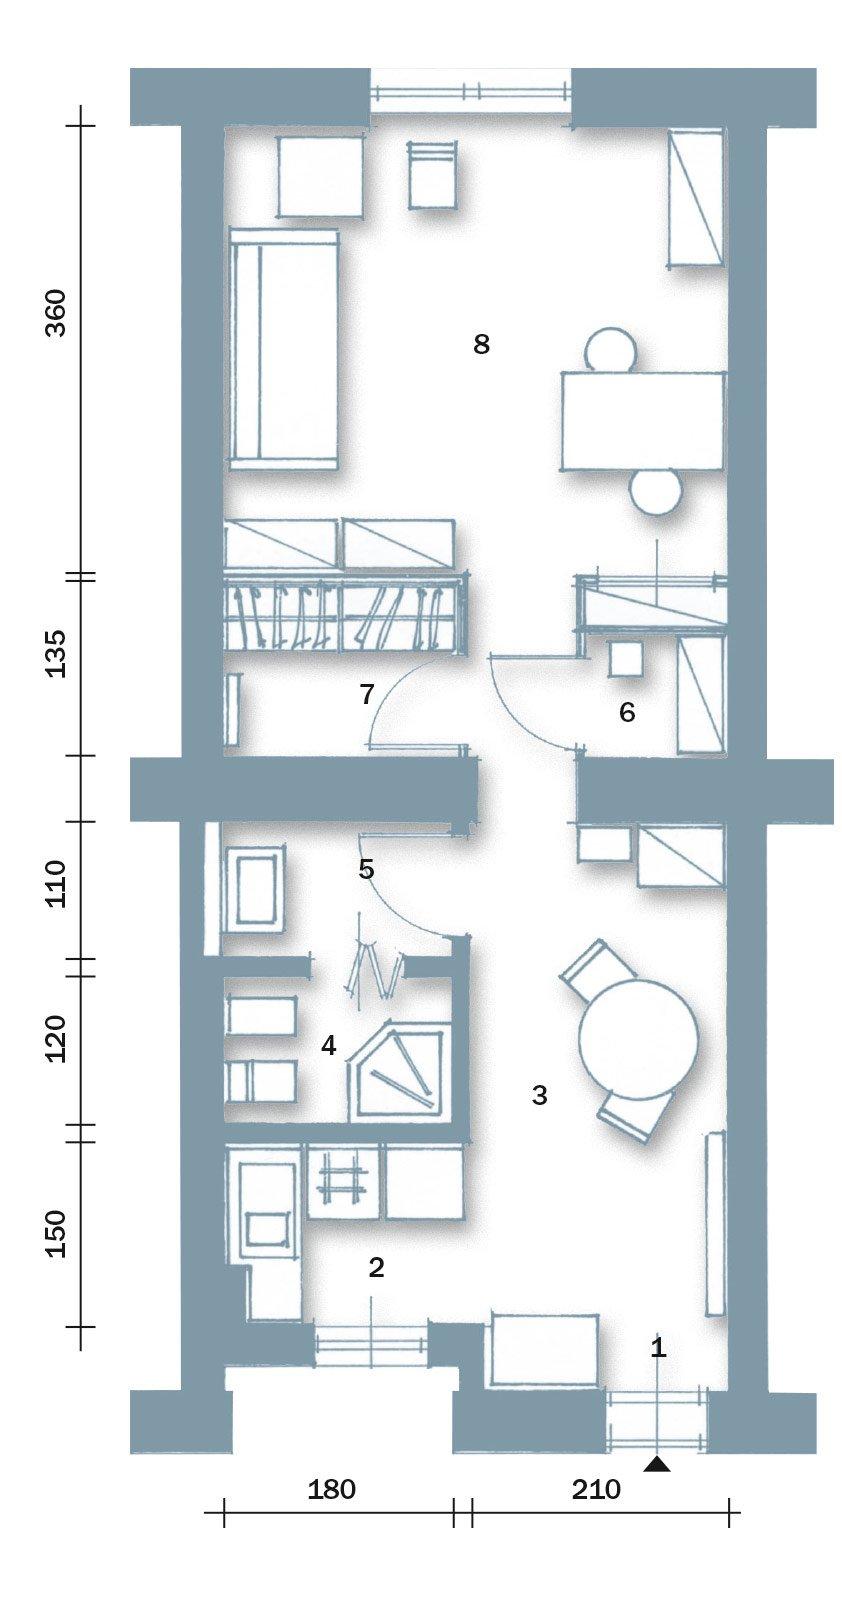 Bilocale di 40 mq una casa fai da te cose di casa for Quattro piani di casa quadrati